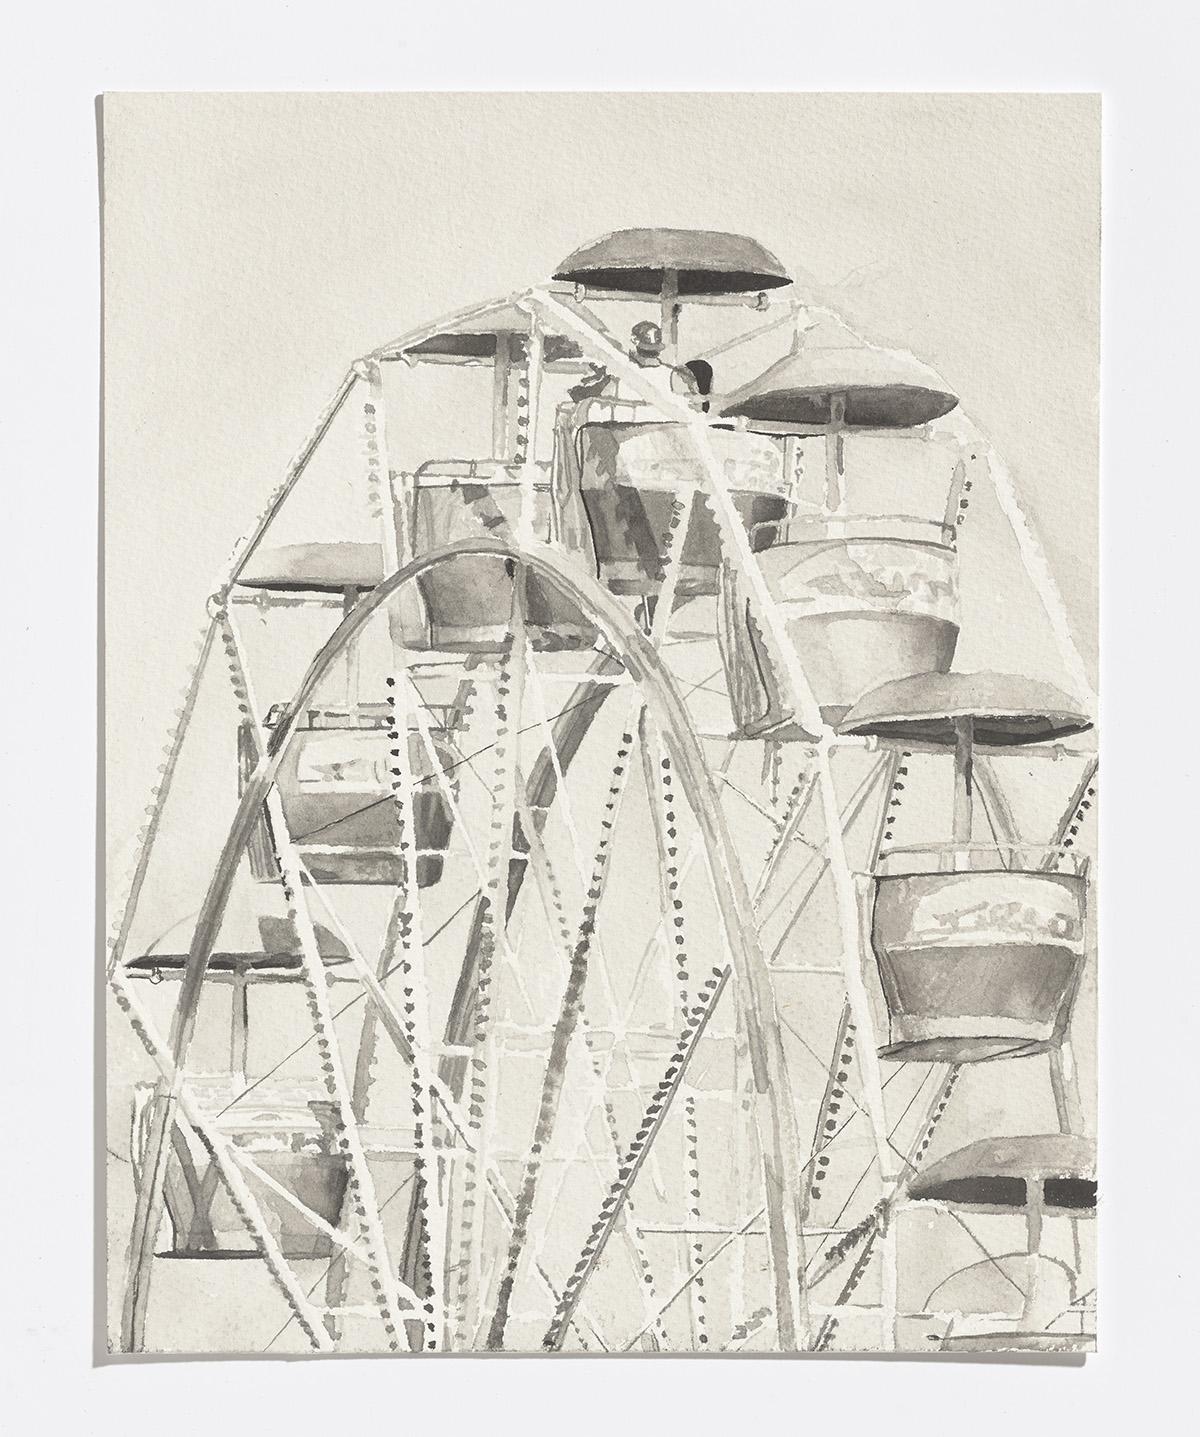 Ferris Wheel,2017,india ink on paper, 1.25 x 8 in